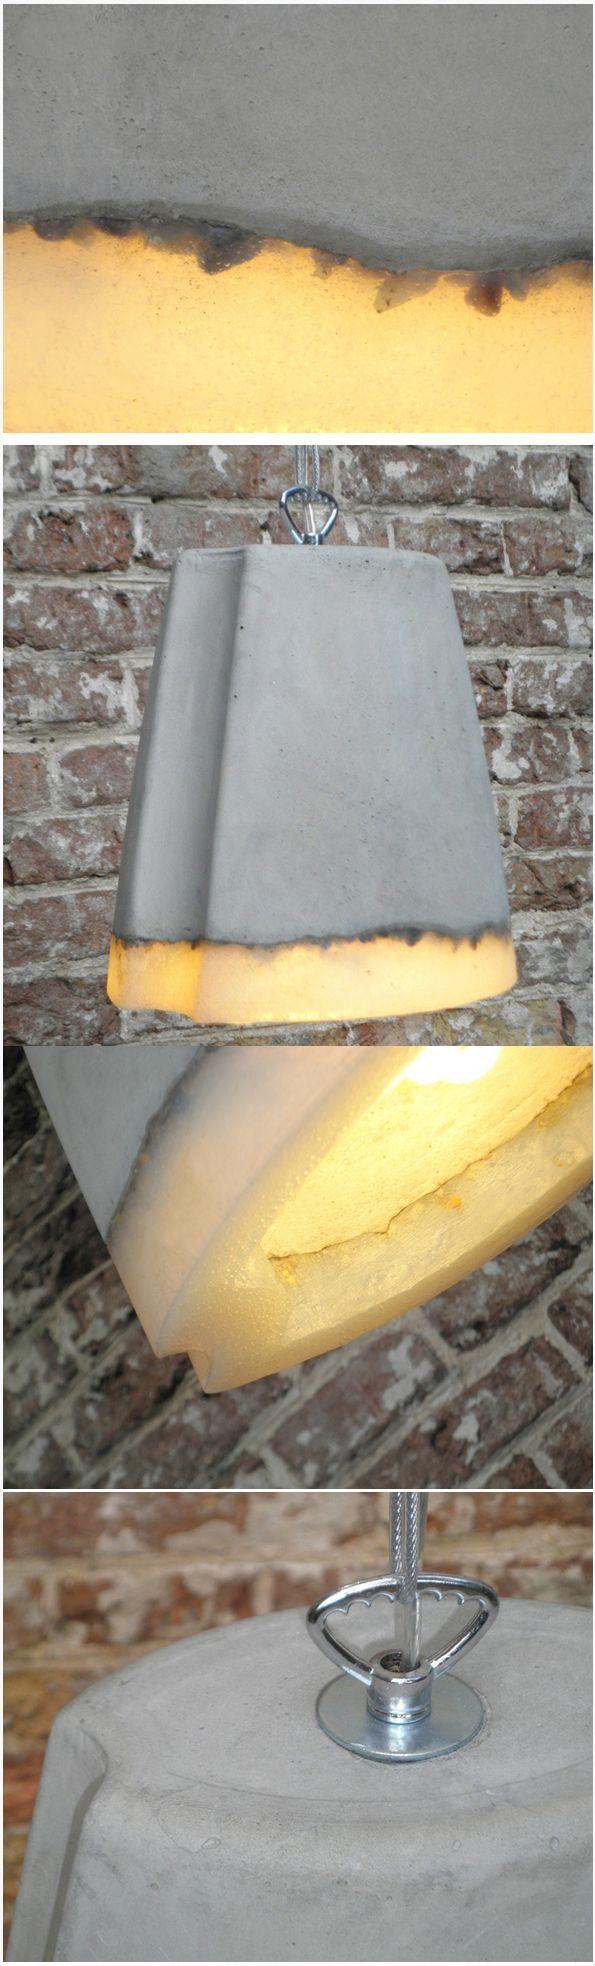 Murano gl floor lamp murano gl floor lamps 173 for at 1stdibs - Concrete Beauty Lighting